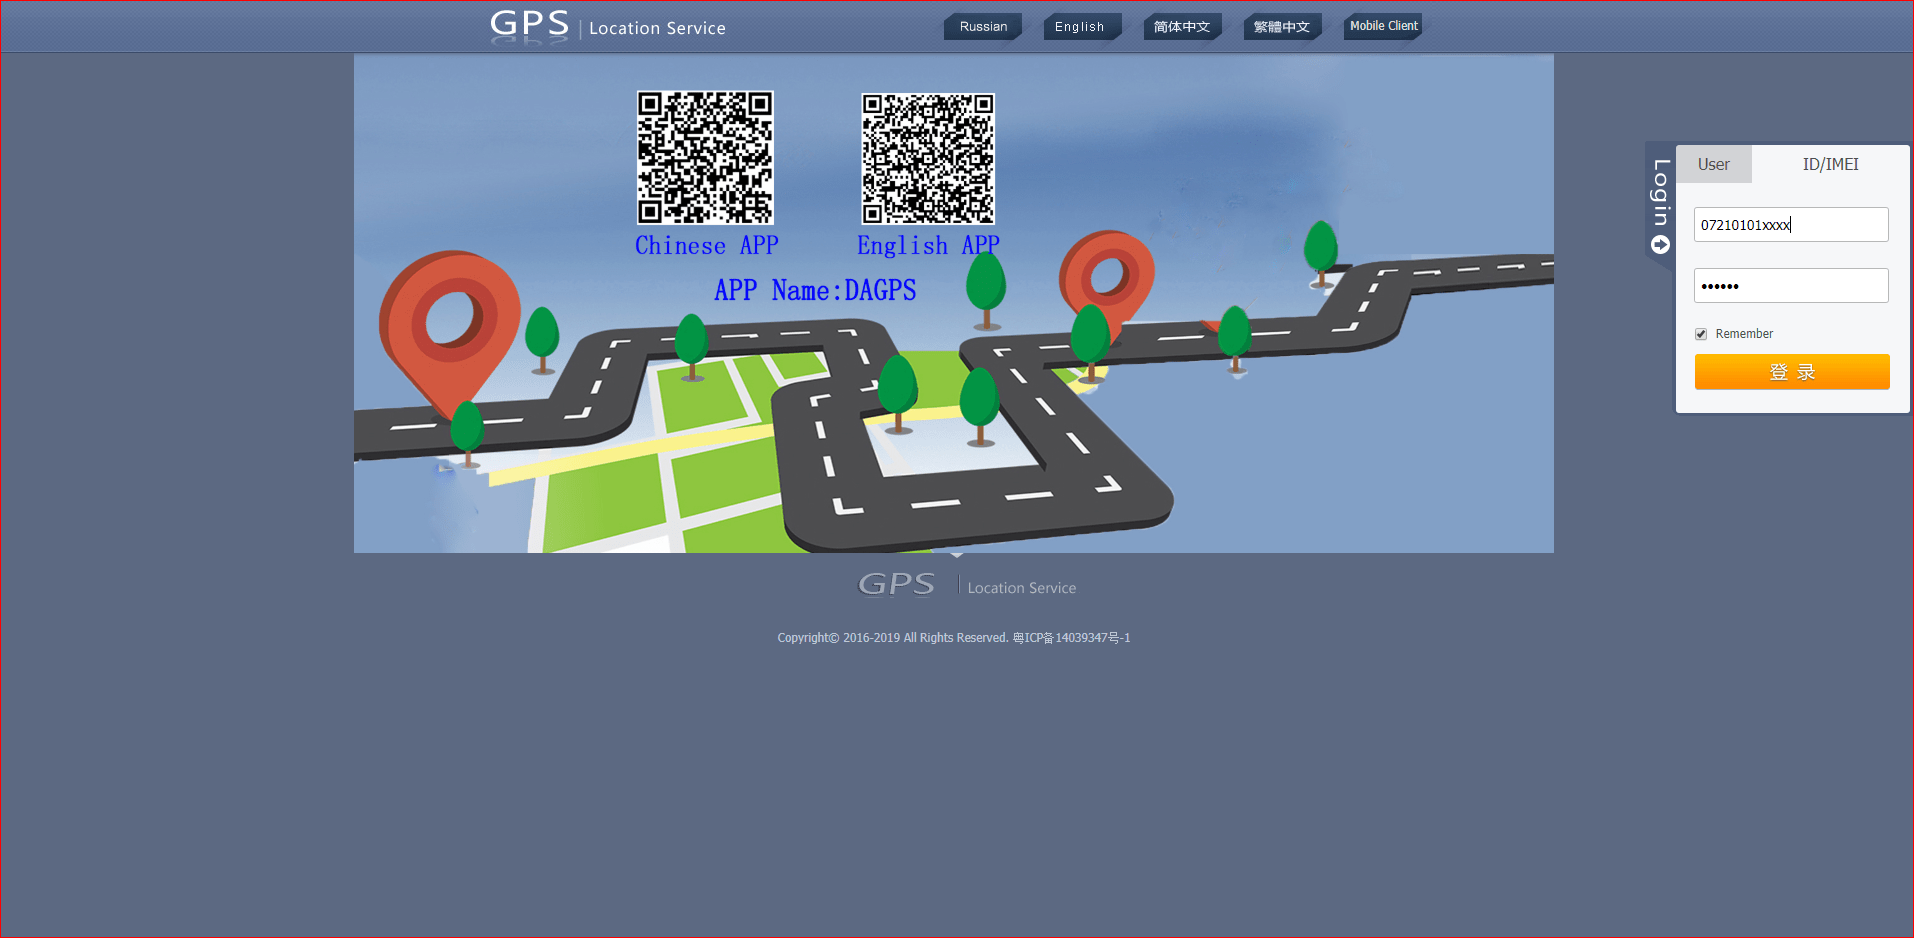 Mini GPS 102B 4 bands GPS GSM GPRS Tracker Device for Vehicle, Car, Motorcycle, Kid, Pet & Elderly, Single Battery OEM www.gagetmou.com www.gps110.org